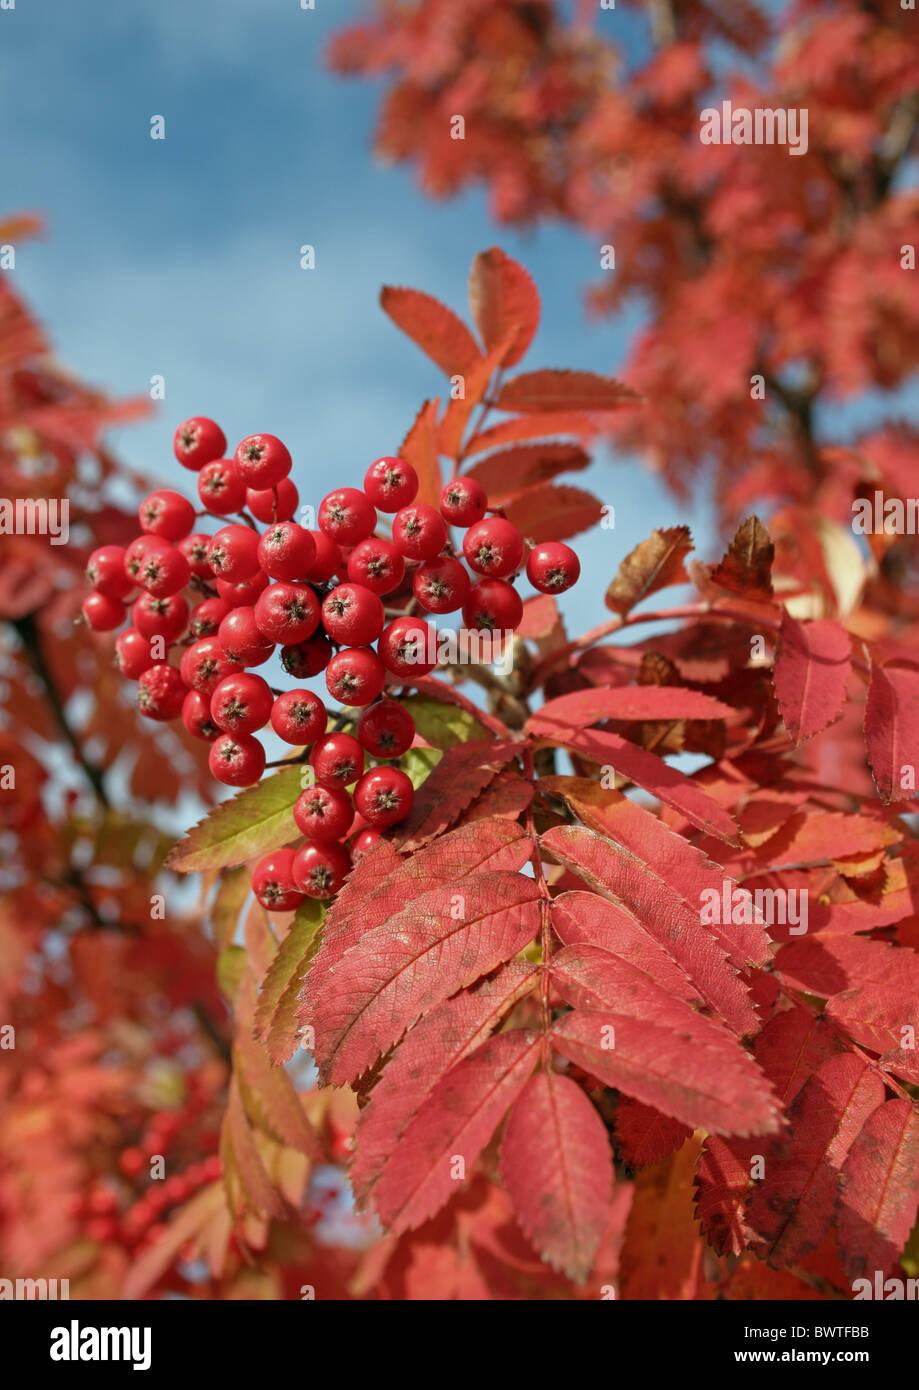 Pflanzen Im September rowan sorbus aucuparia herbst farben september finnland pihlaja